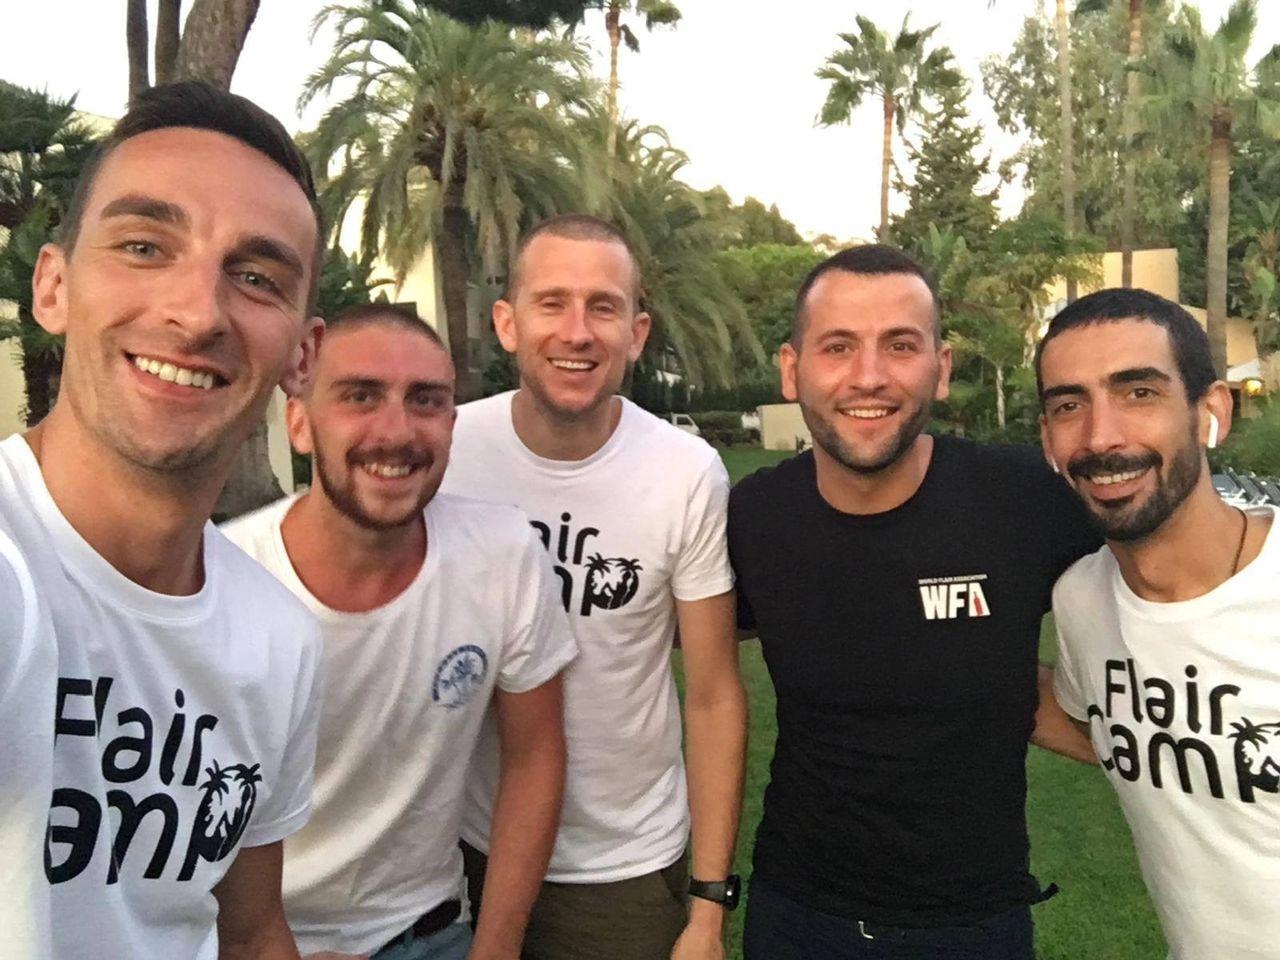 Left to right, Marek, Jumbles, Tom, Tomek & Pedro flair camp 2019